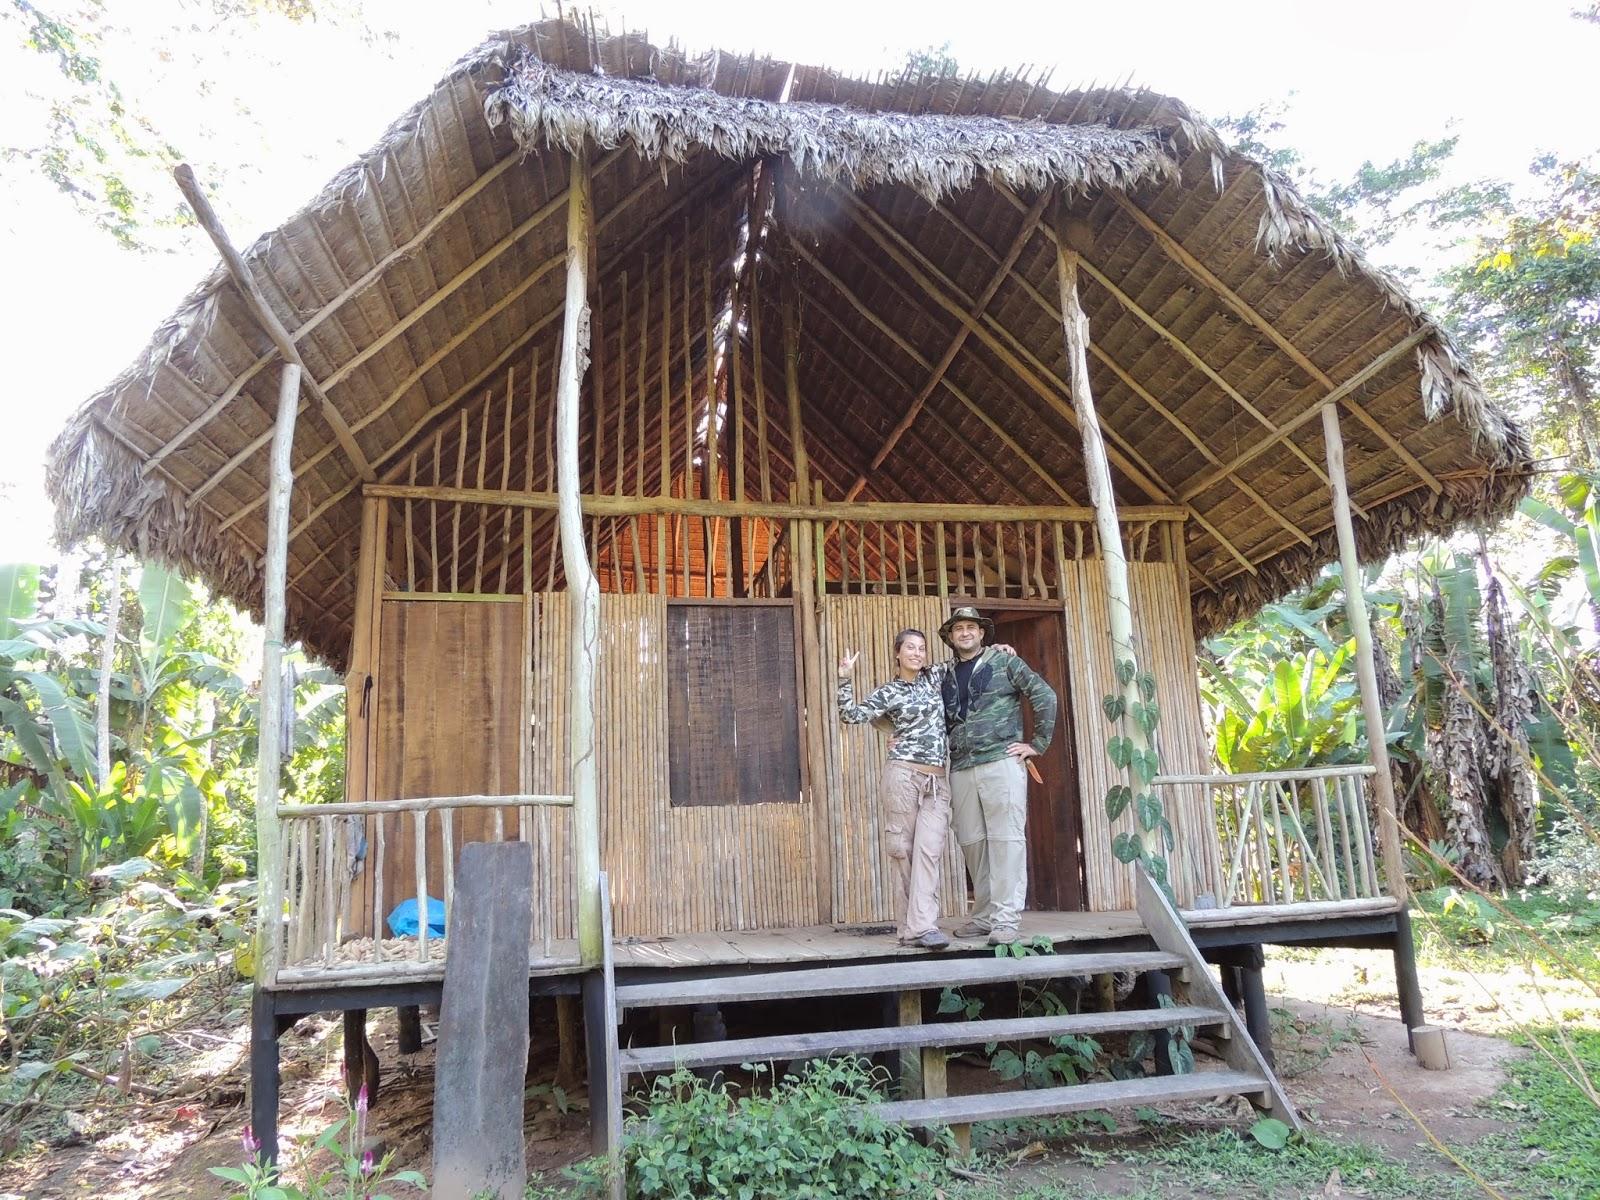 cabaña en la selva